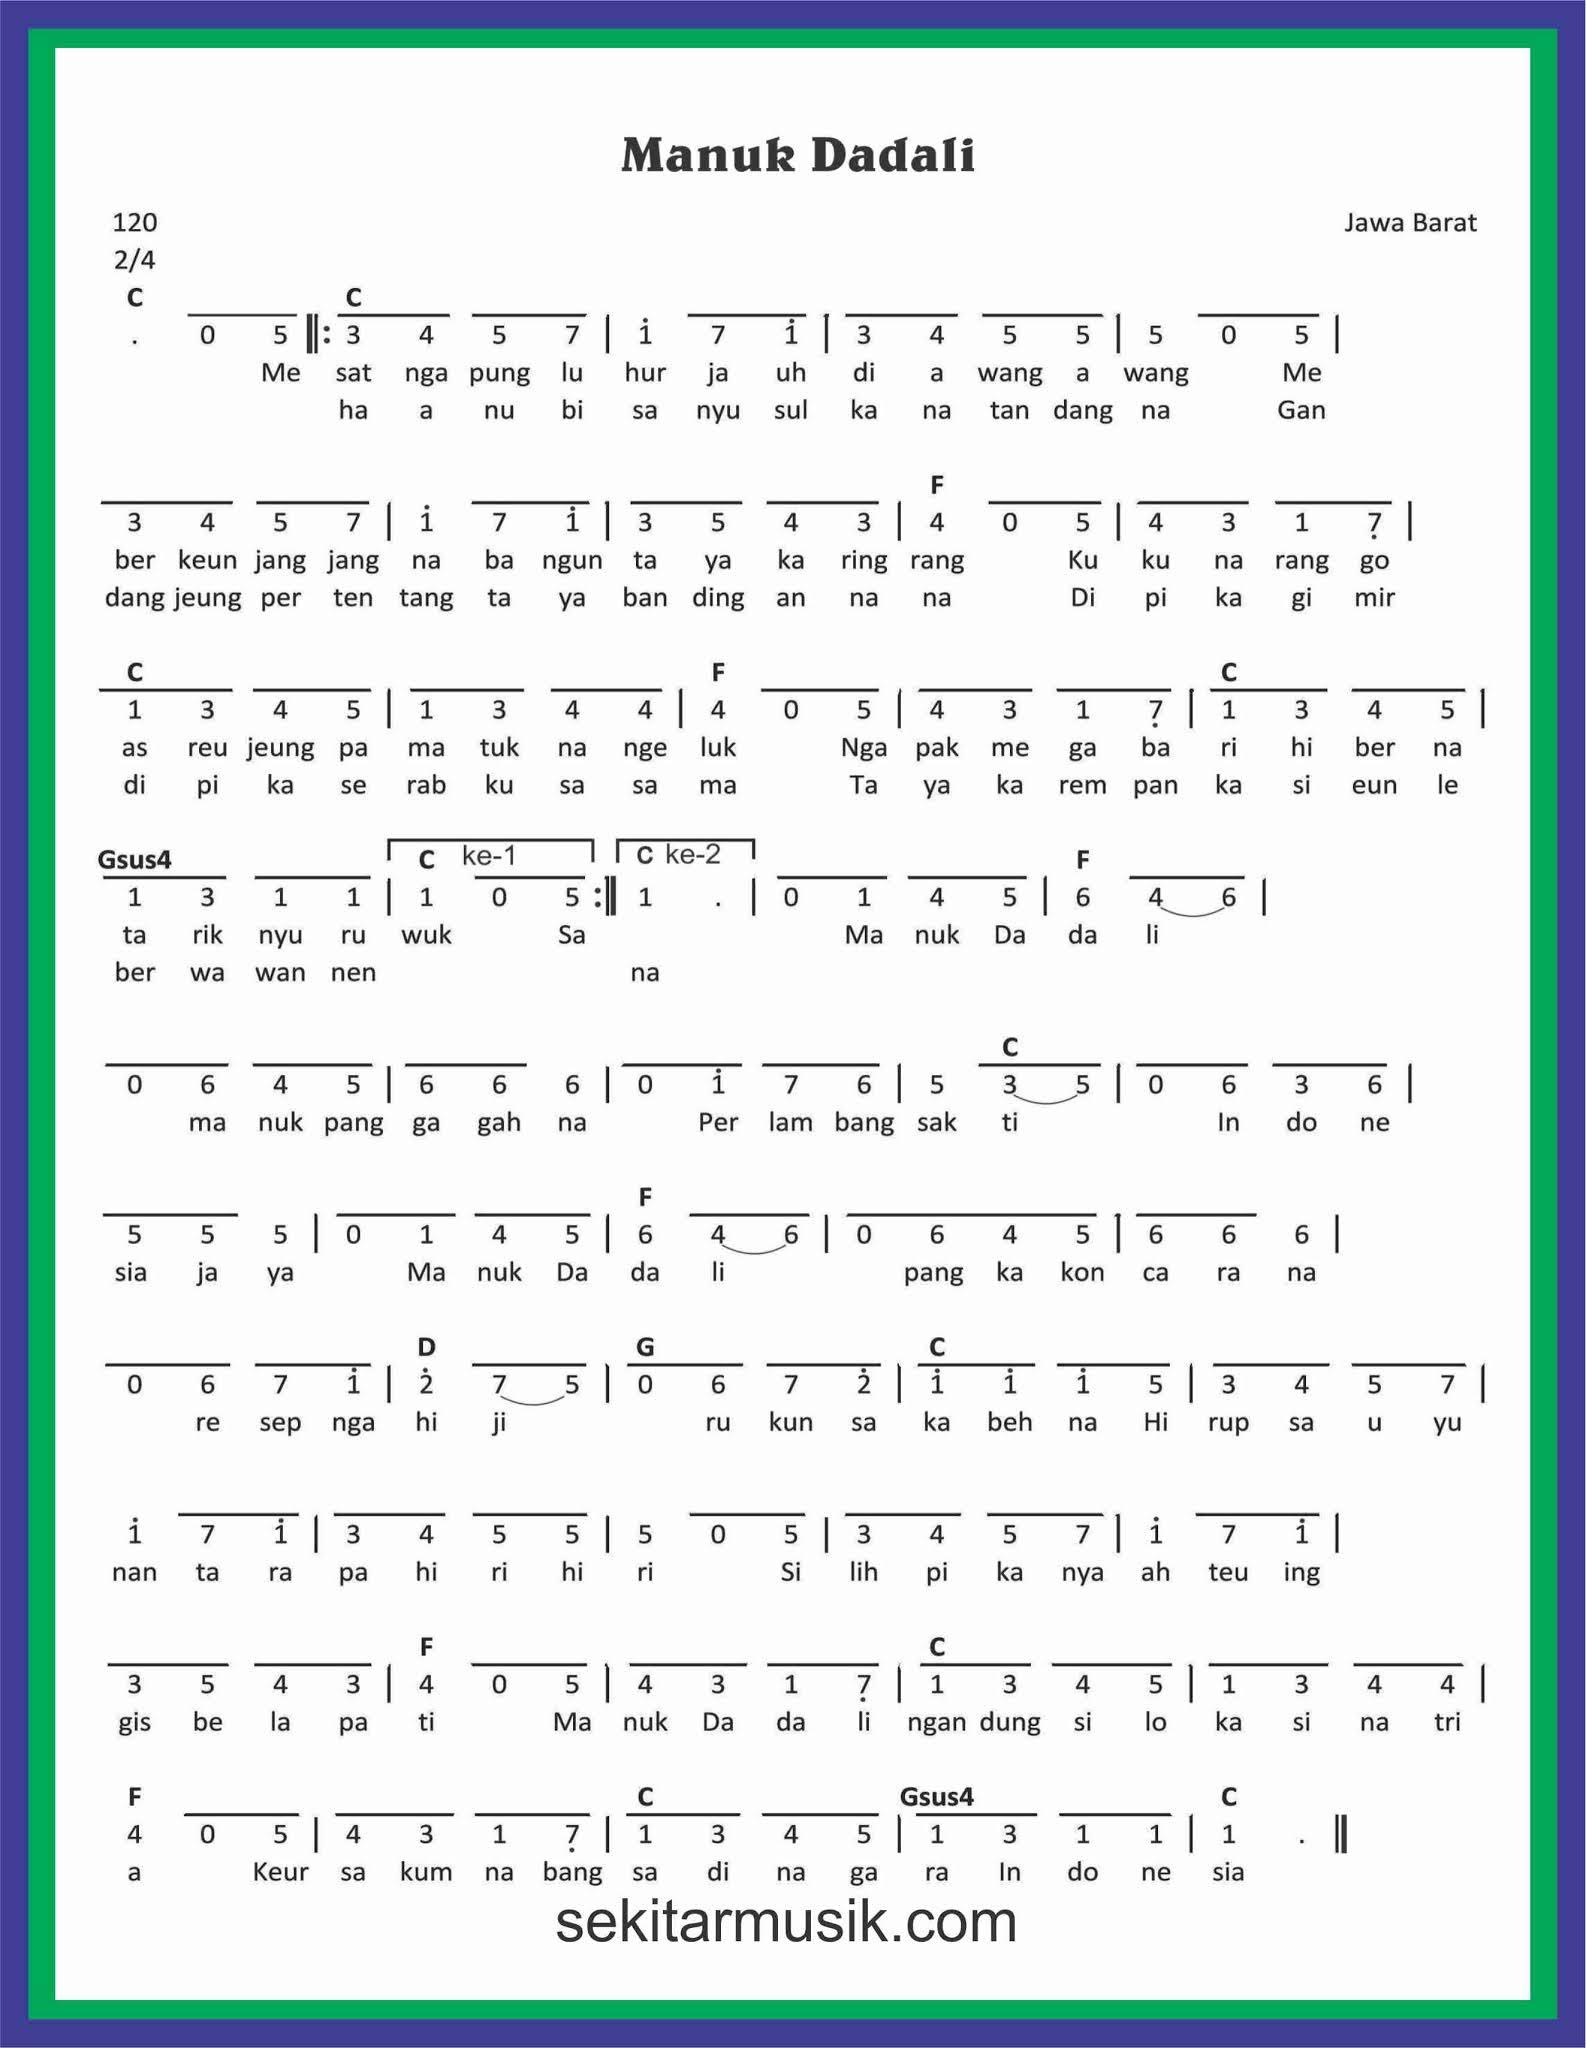 Not Angka Manuk Dadali - Not angka lagu Terbaru